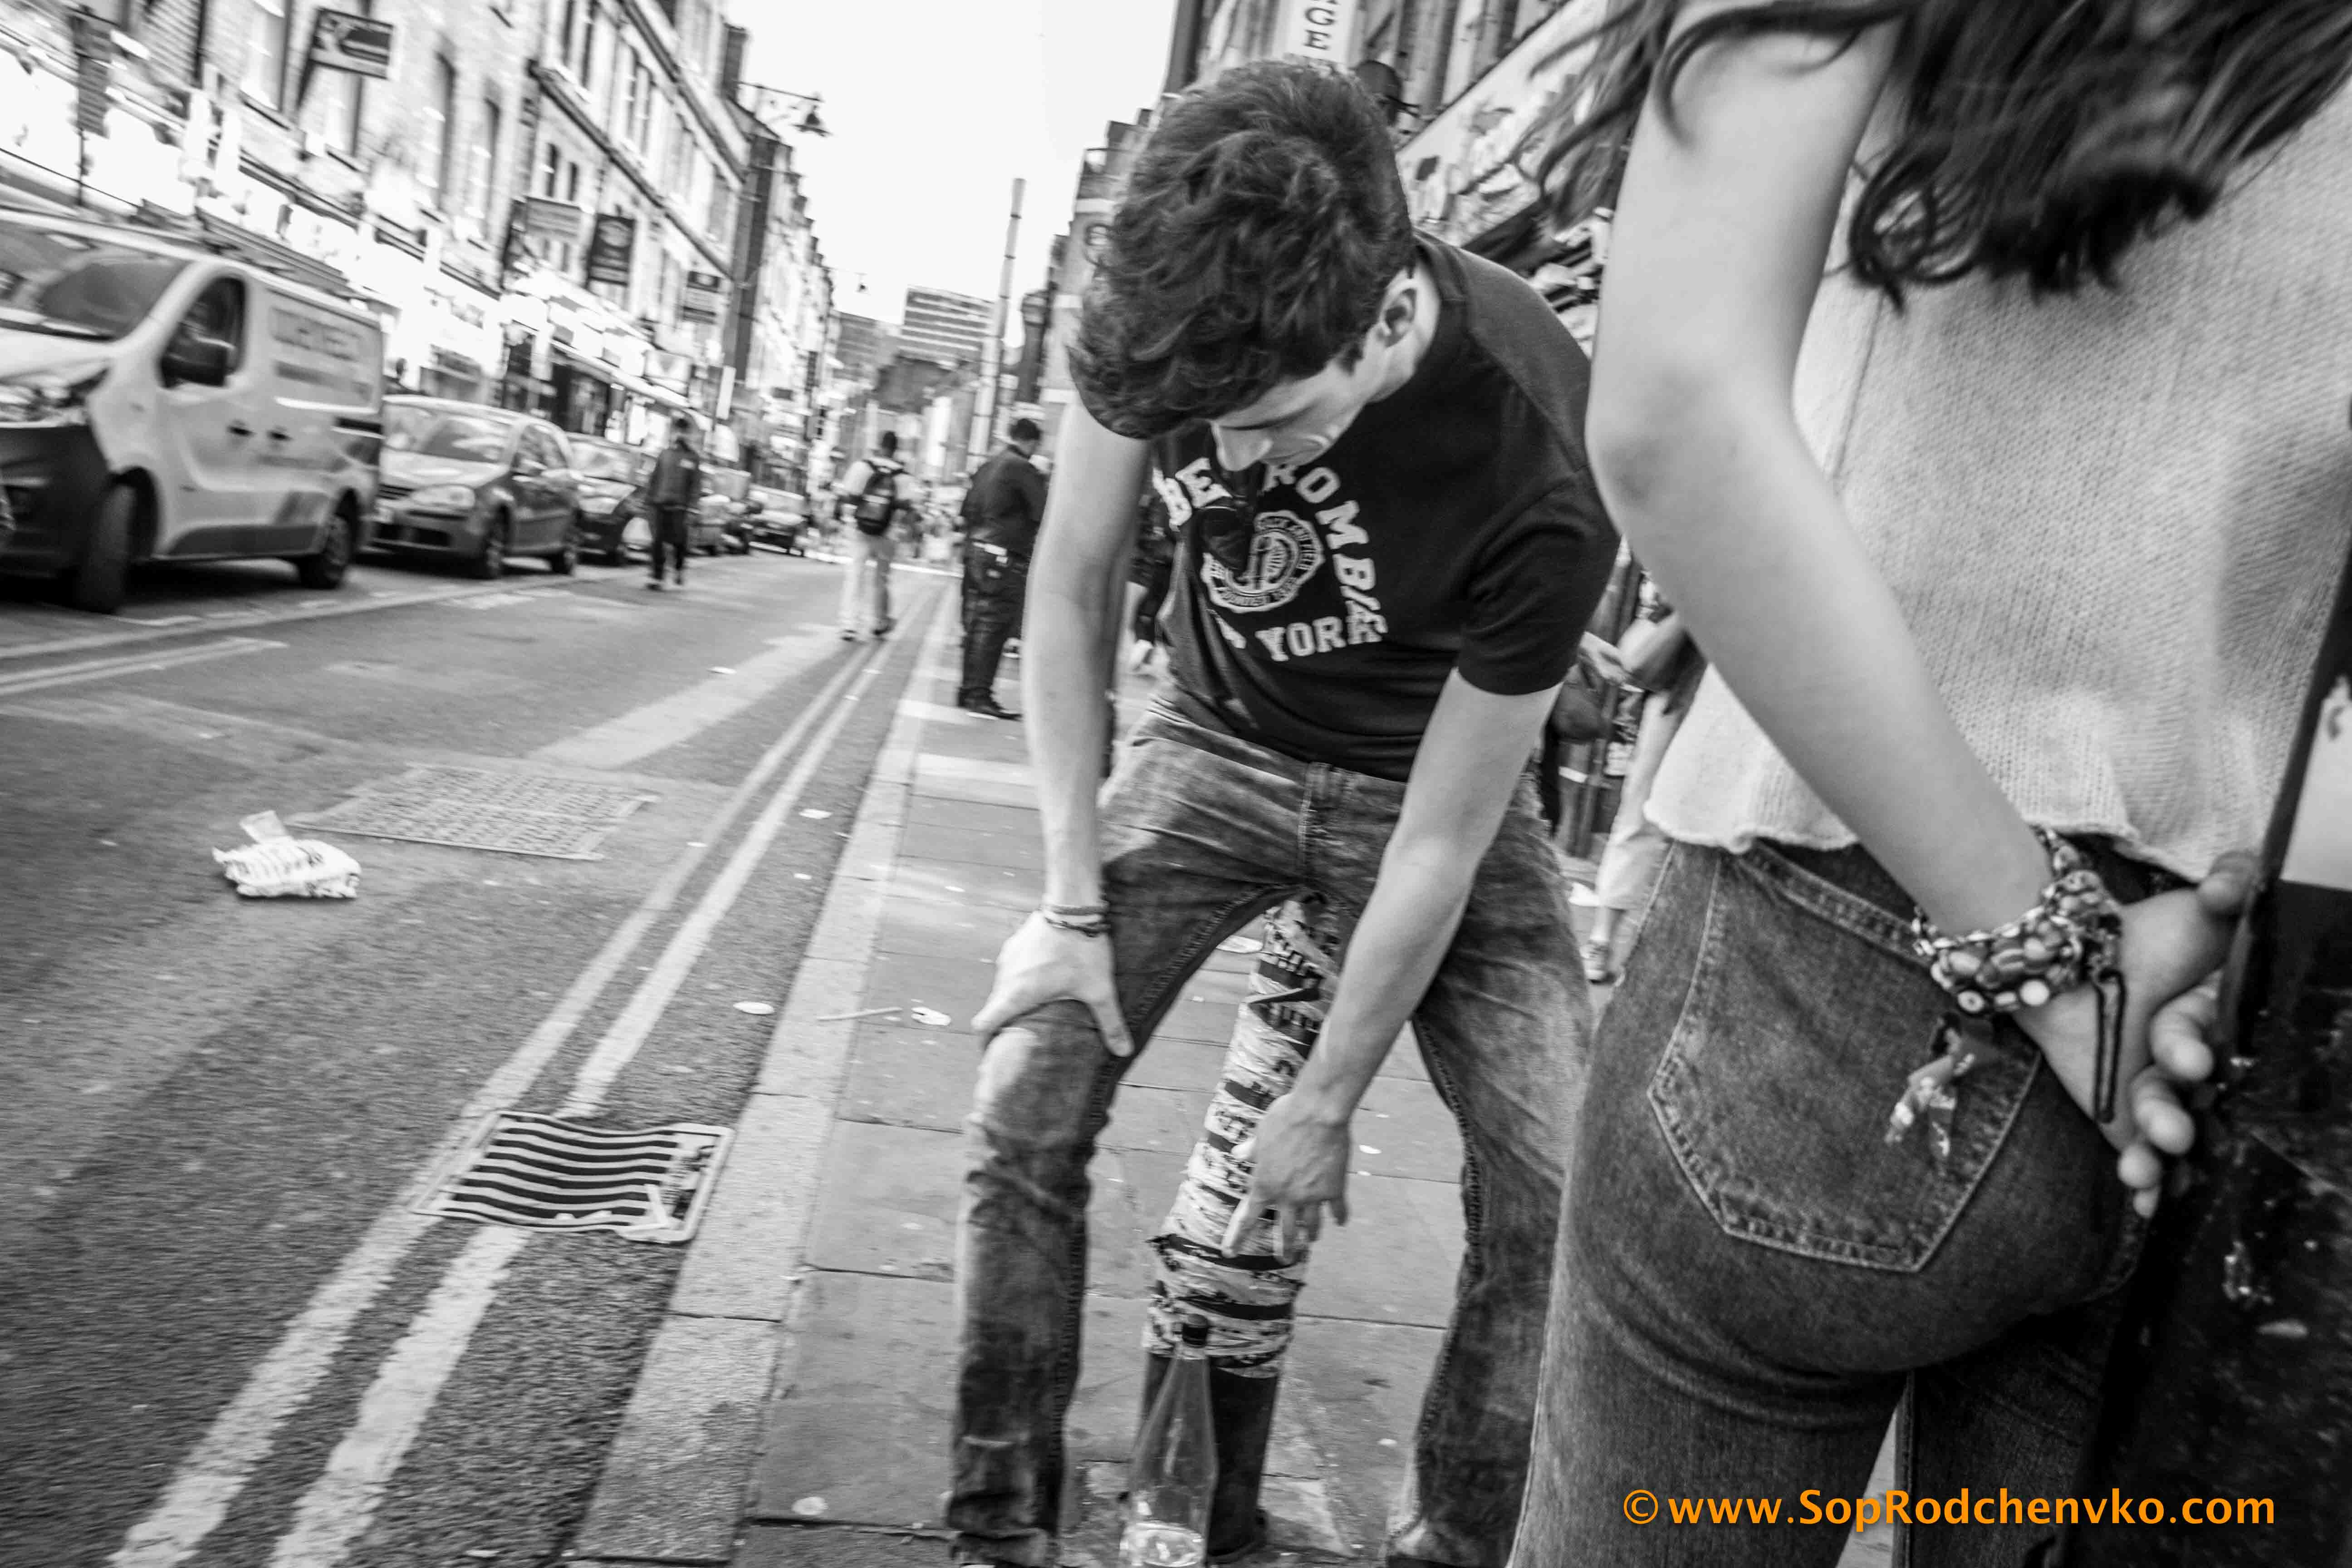 East London 2016